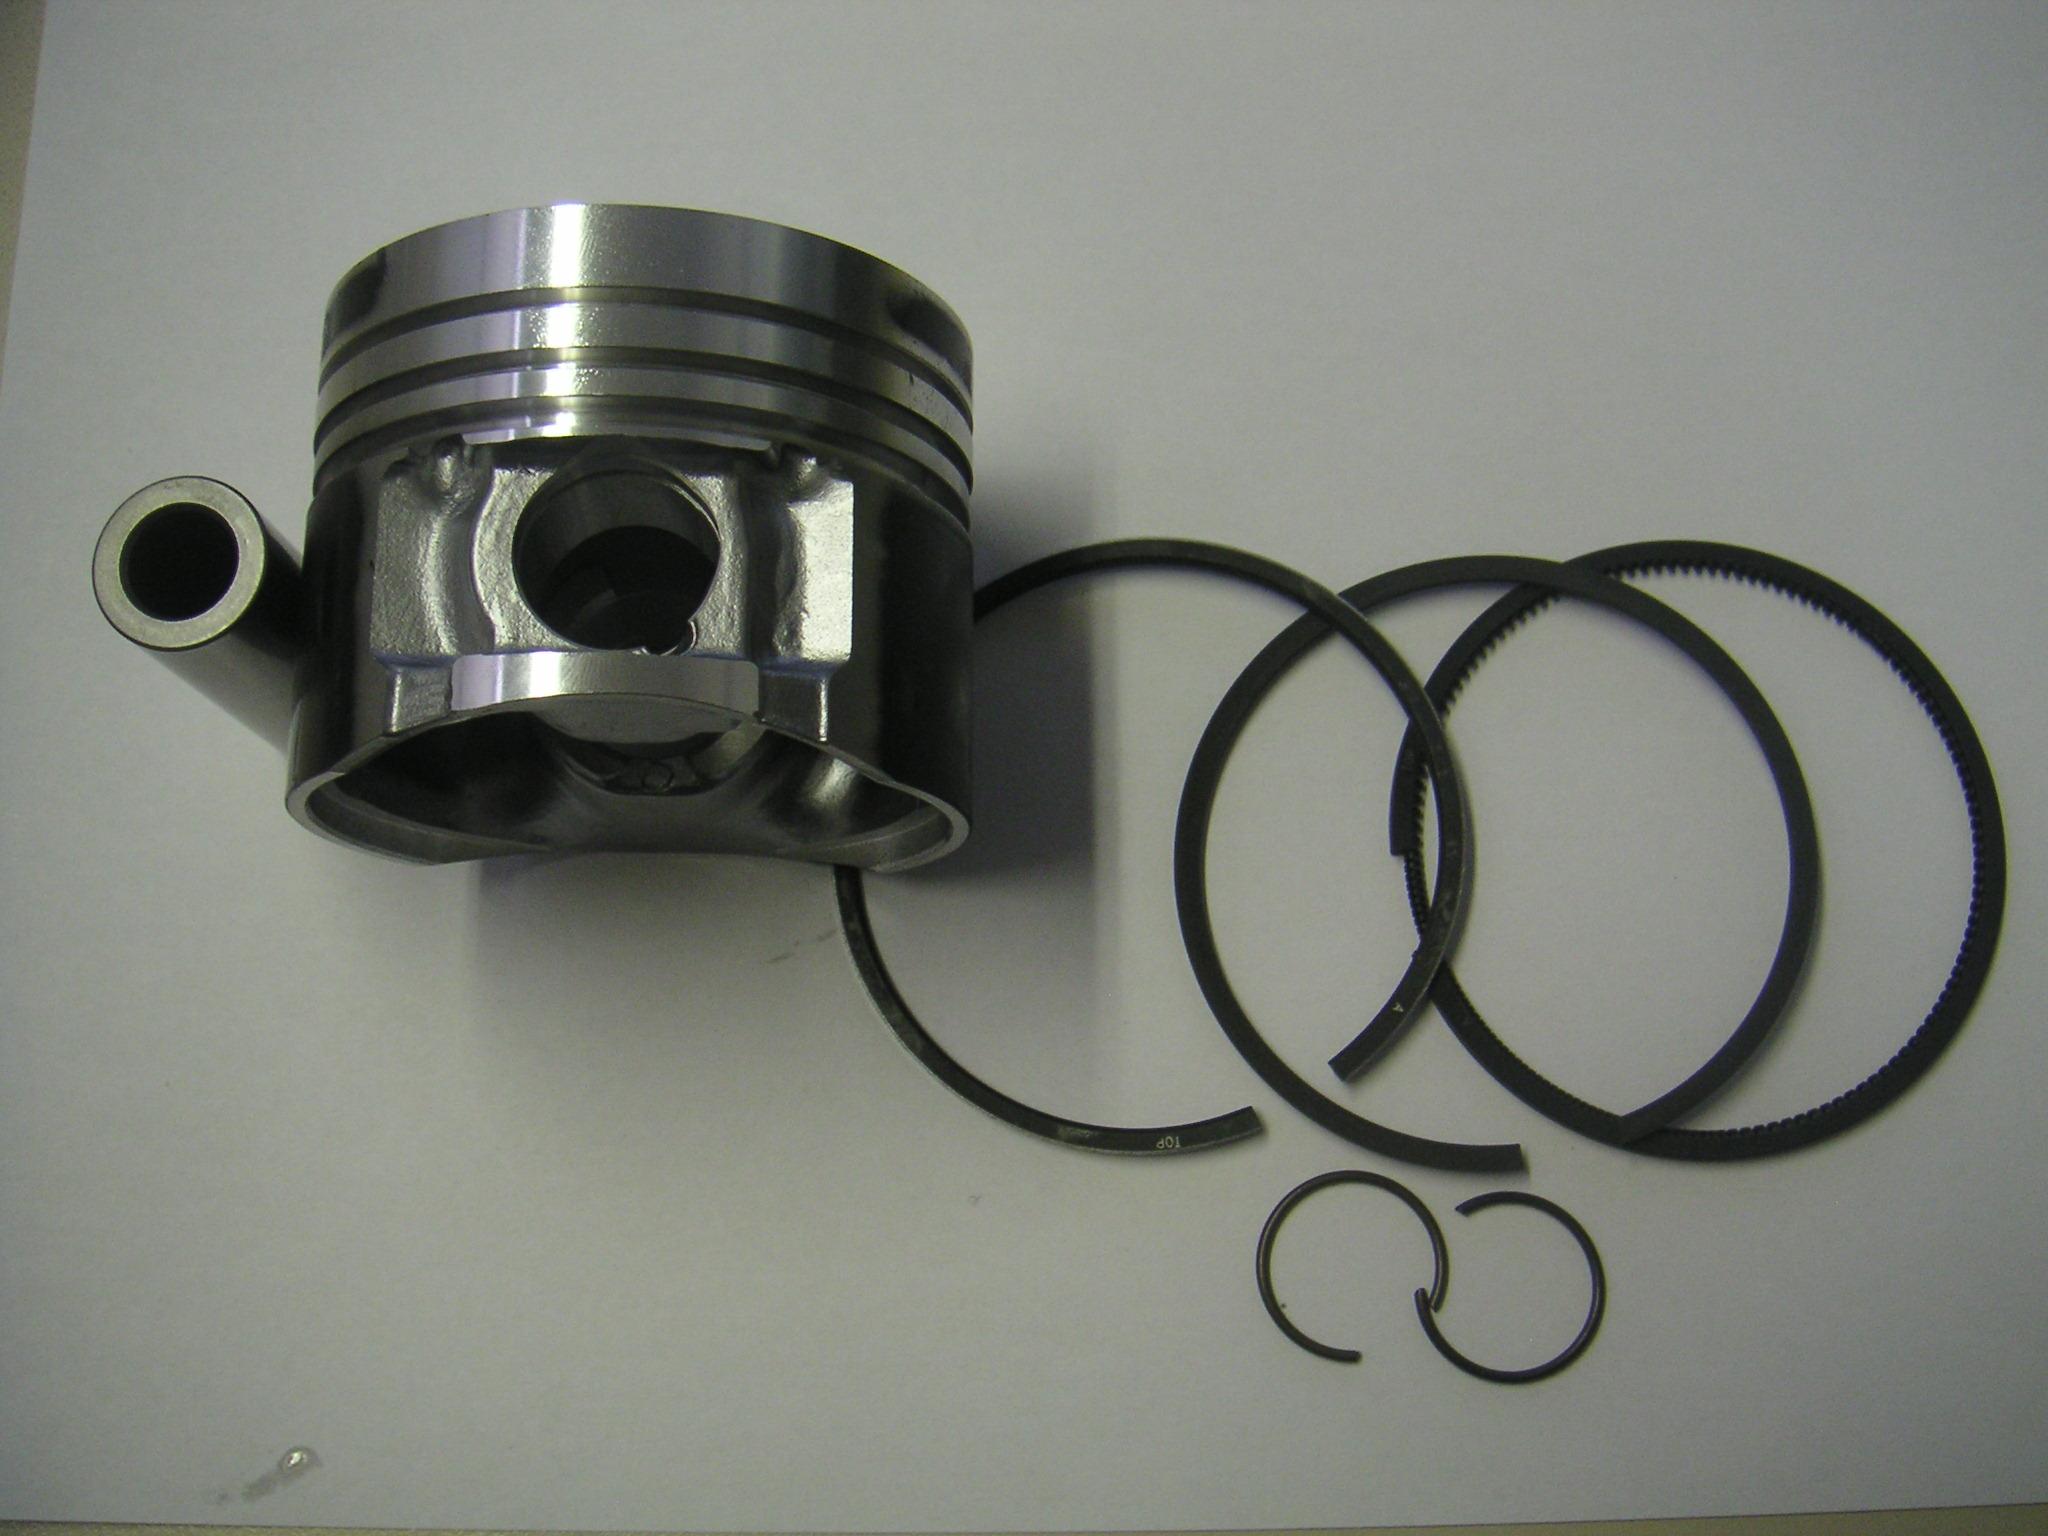 Piston complet LDW702 LDW1003 LDW1404 LOMBARDINI SILEO 1000 SILEO 1400 - FINIMPIANTI FIN028PC00 LOMBARDINI 6501512